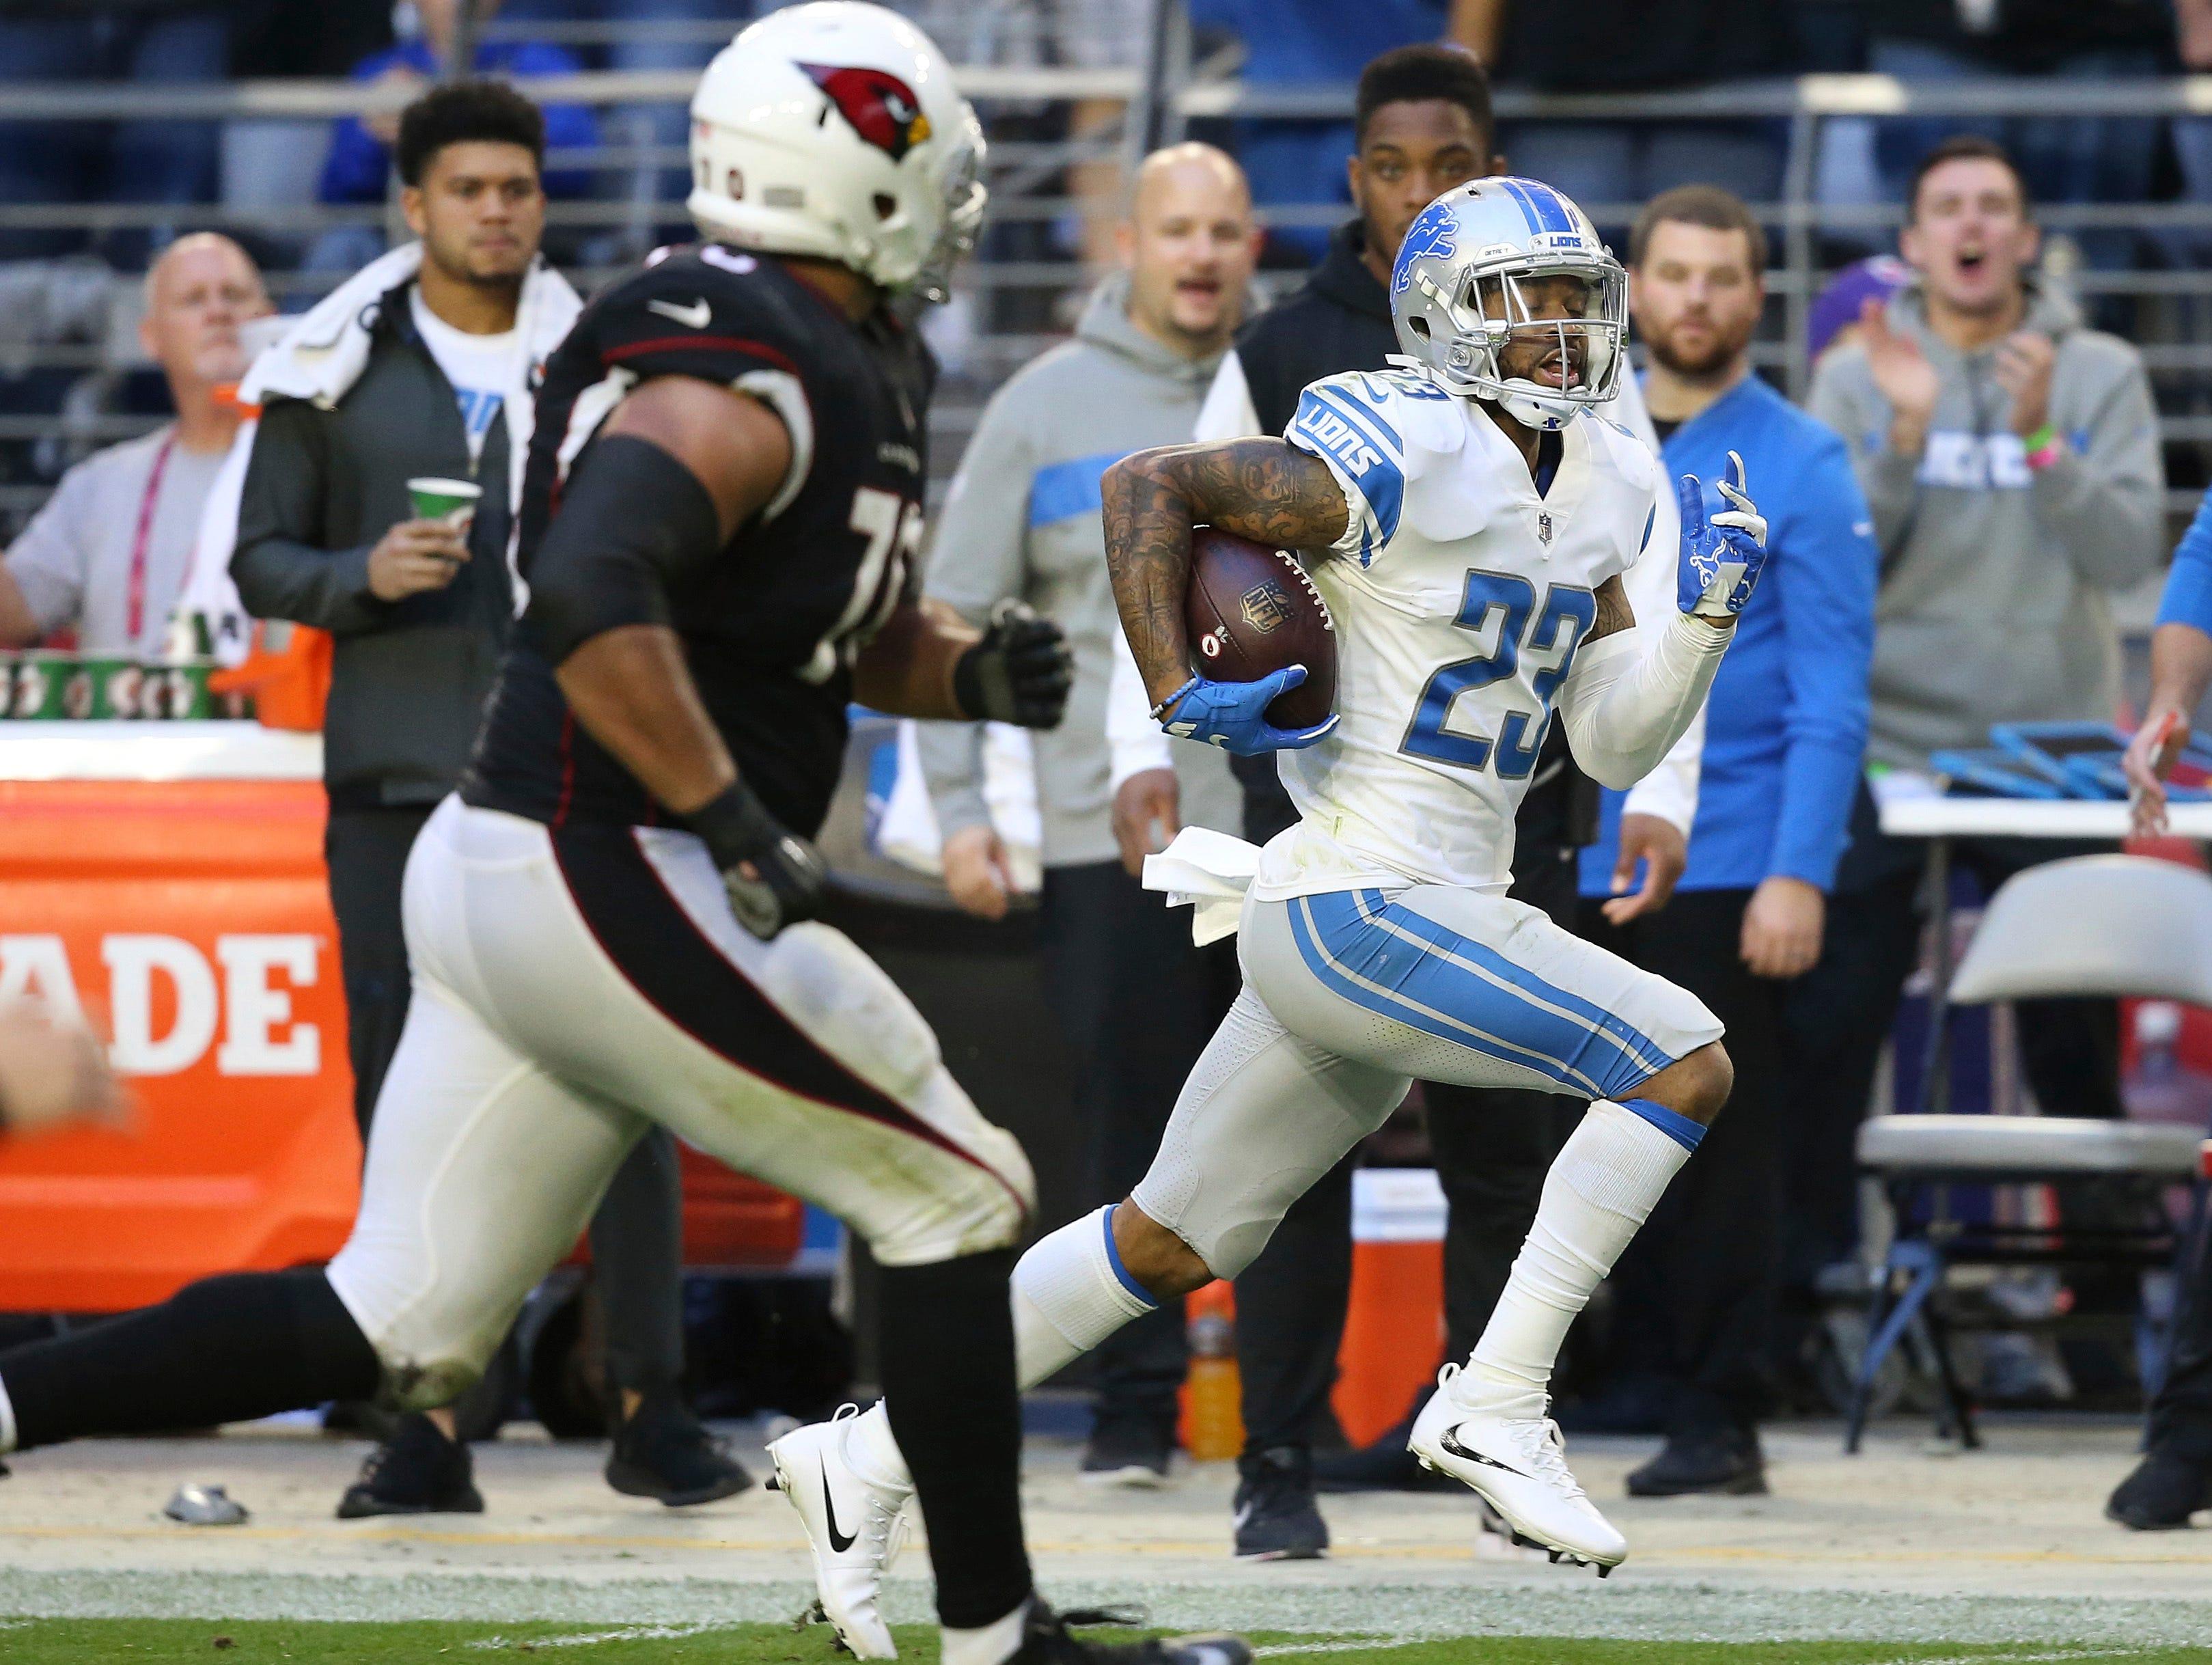 Detroit Lions cornerback Darius Slay (23) runs back an interception for a touchdown agsint the Arizona Cardinals during the second half.